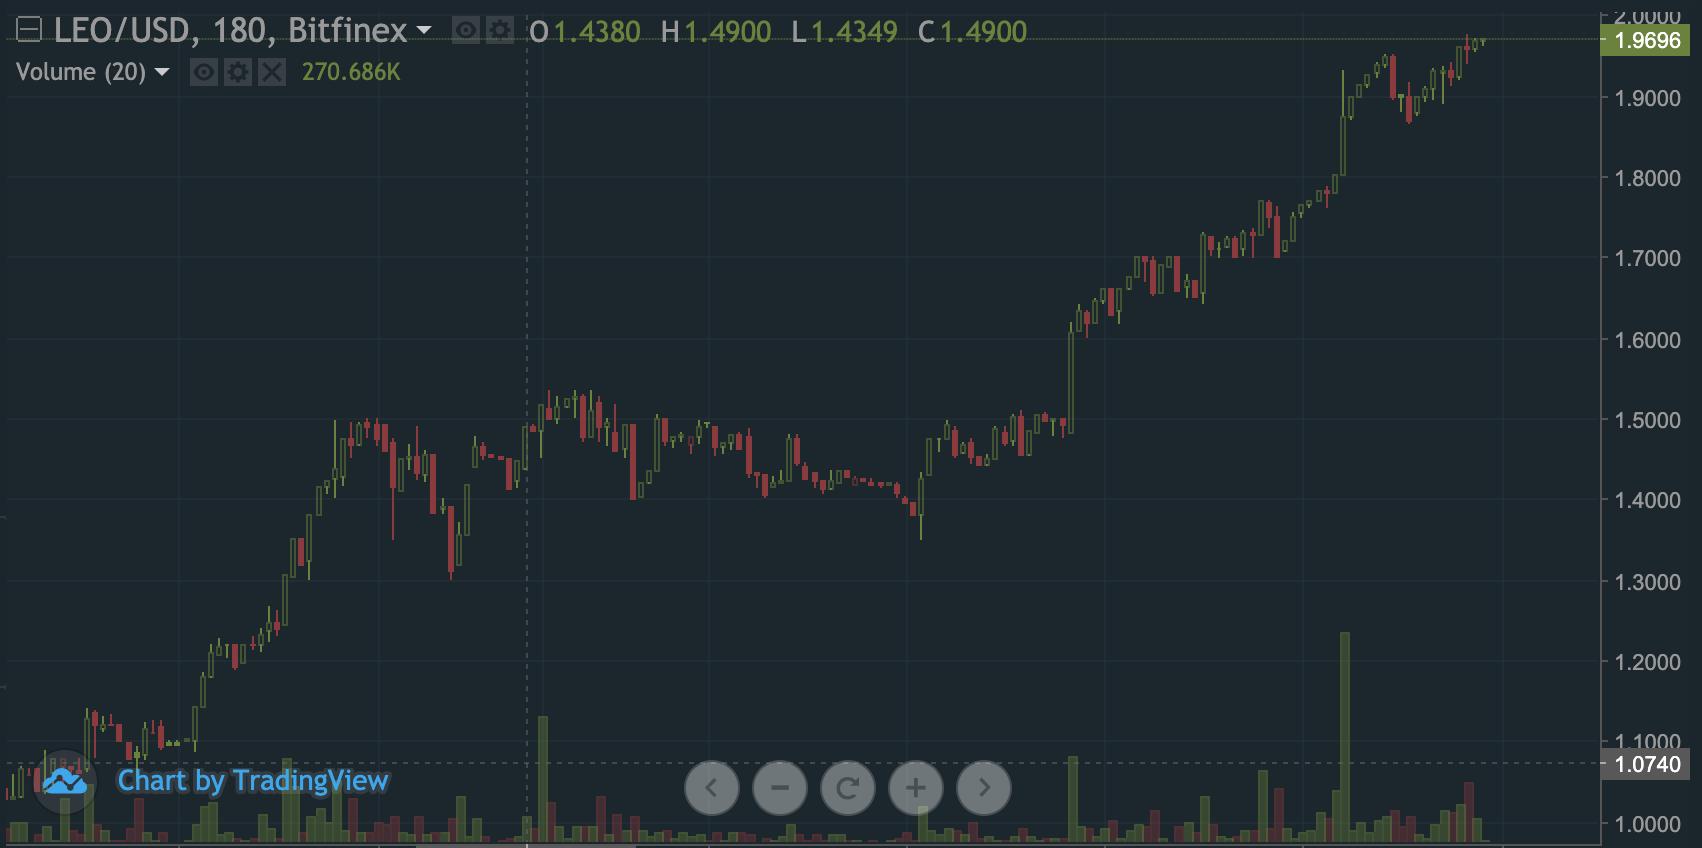 LEO/USDT trading price on Bitfinex as of June 12th